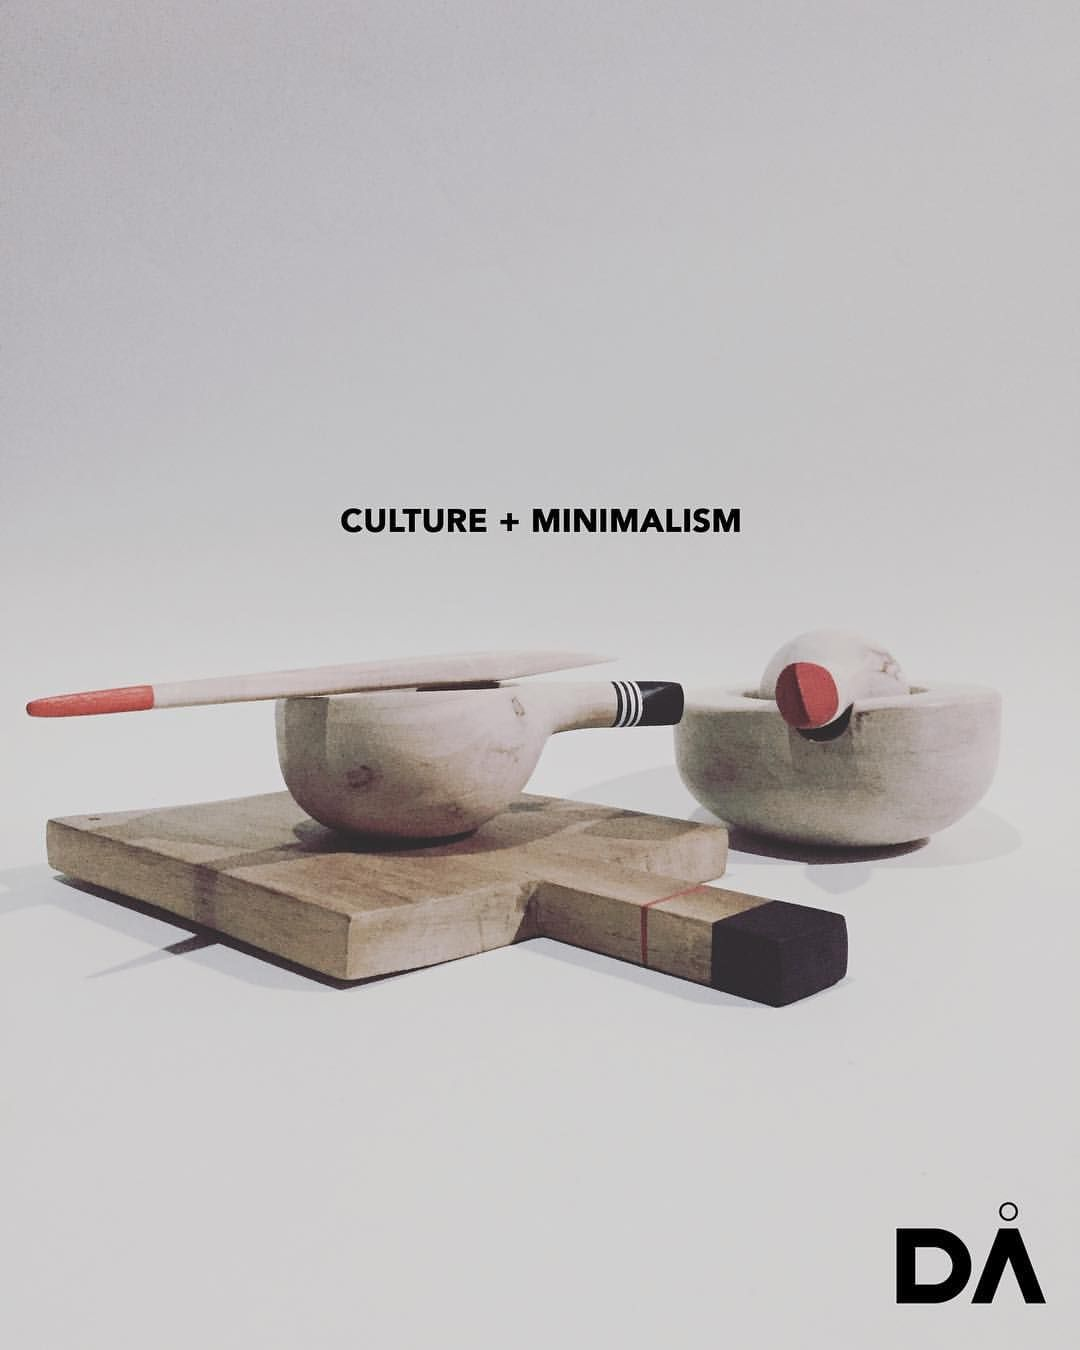 The Future Is DÅ. #DÅlagos #DÅbrand #DÅlifestyle #culture